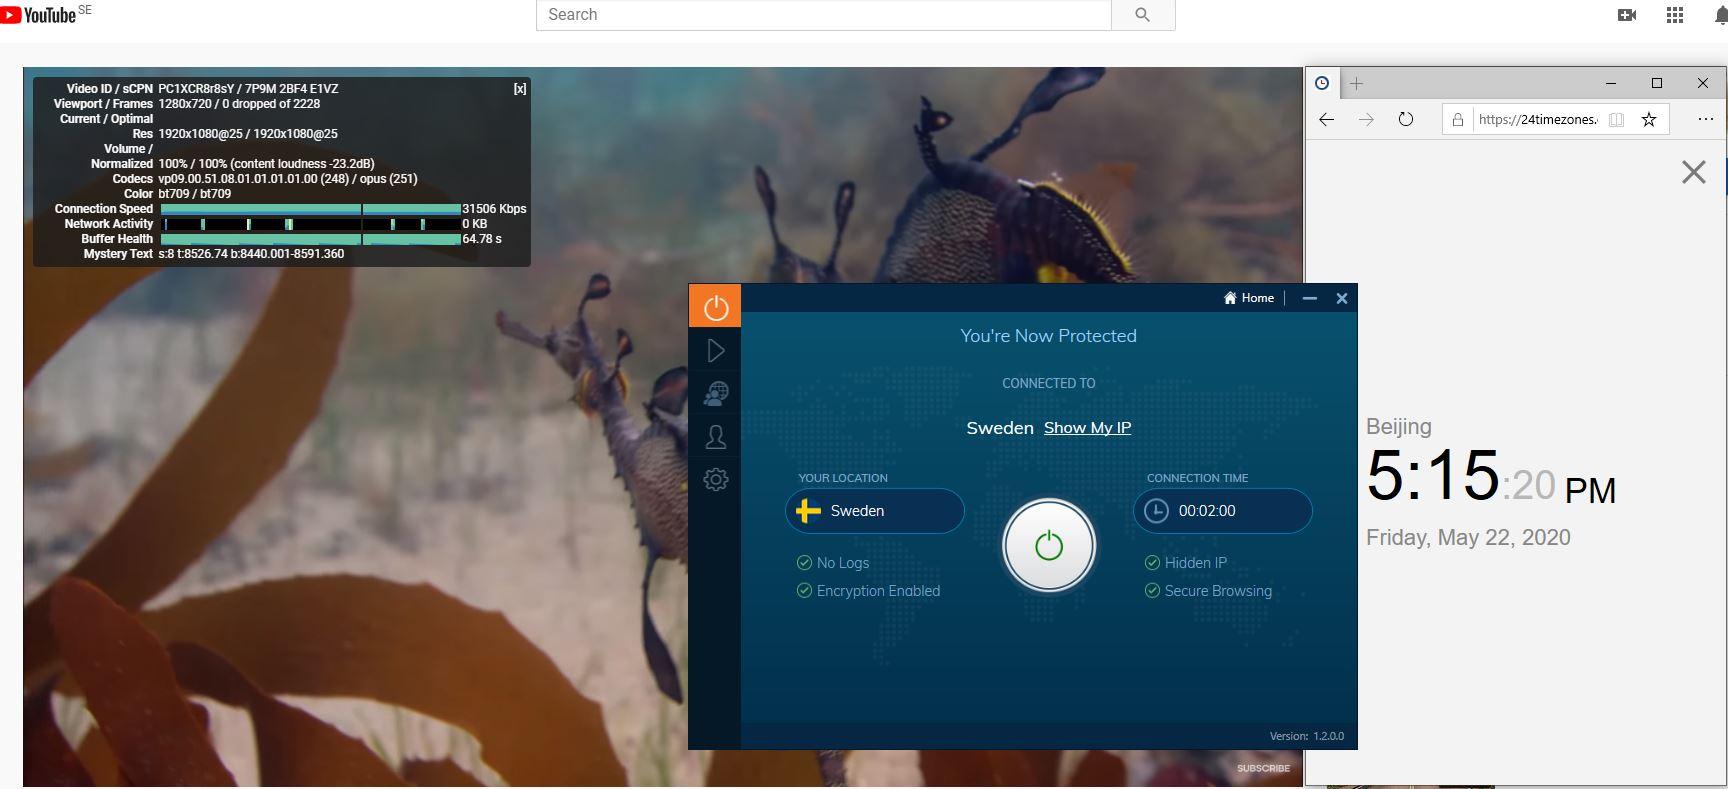 Windows10 IvacyVPN Sweden 中国VPN 翻墙 科学上网 youtube测速-20200522